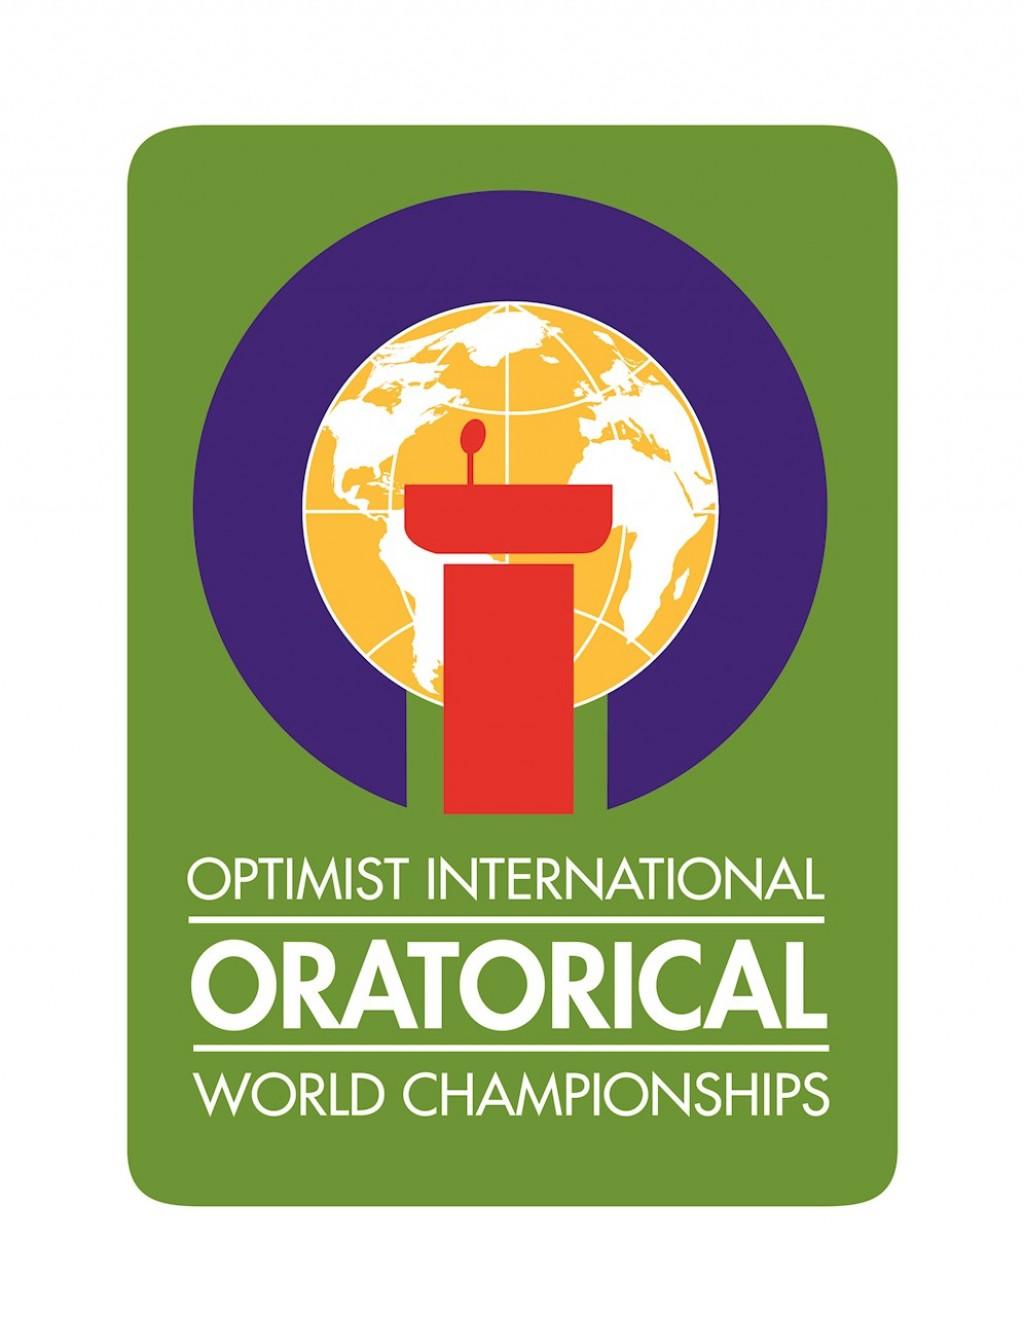 006 Optimist International Essay Contest Example Oratorical High Wondrous Winners Rules Large